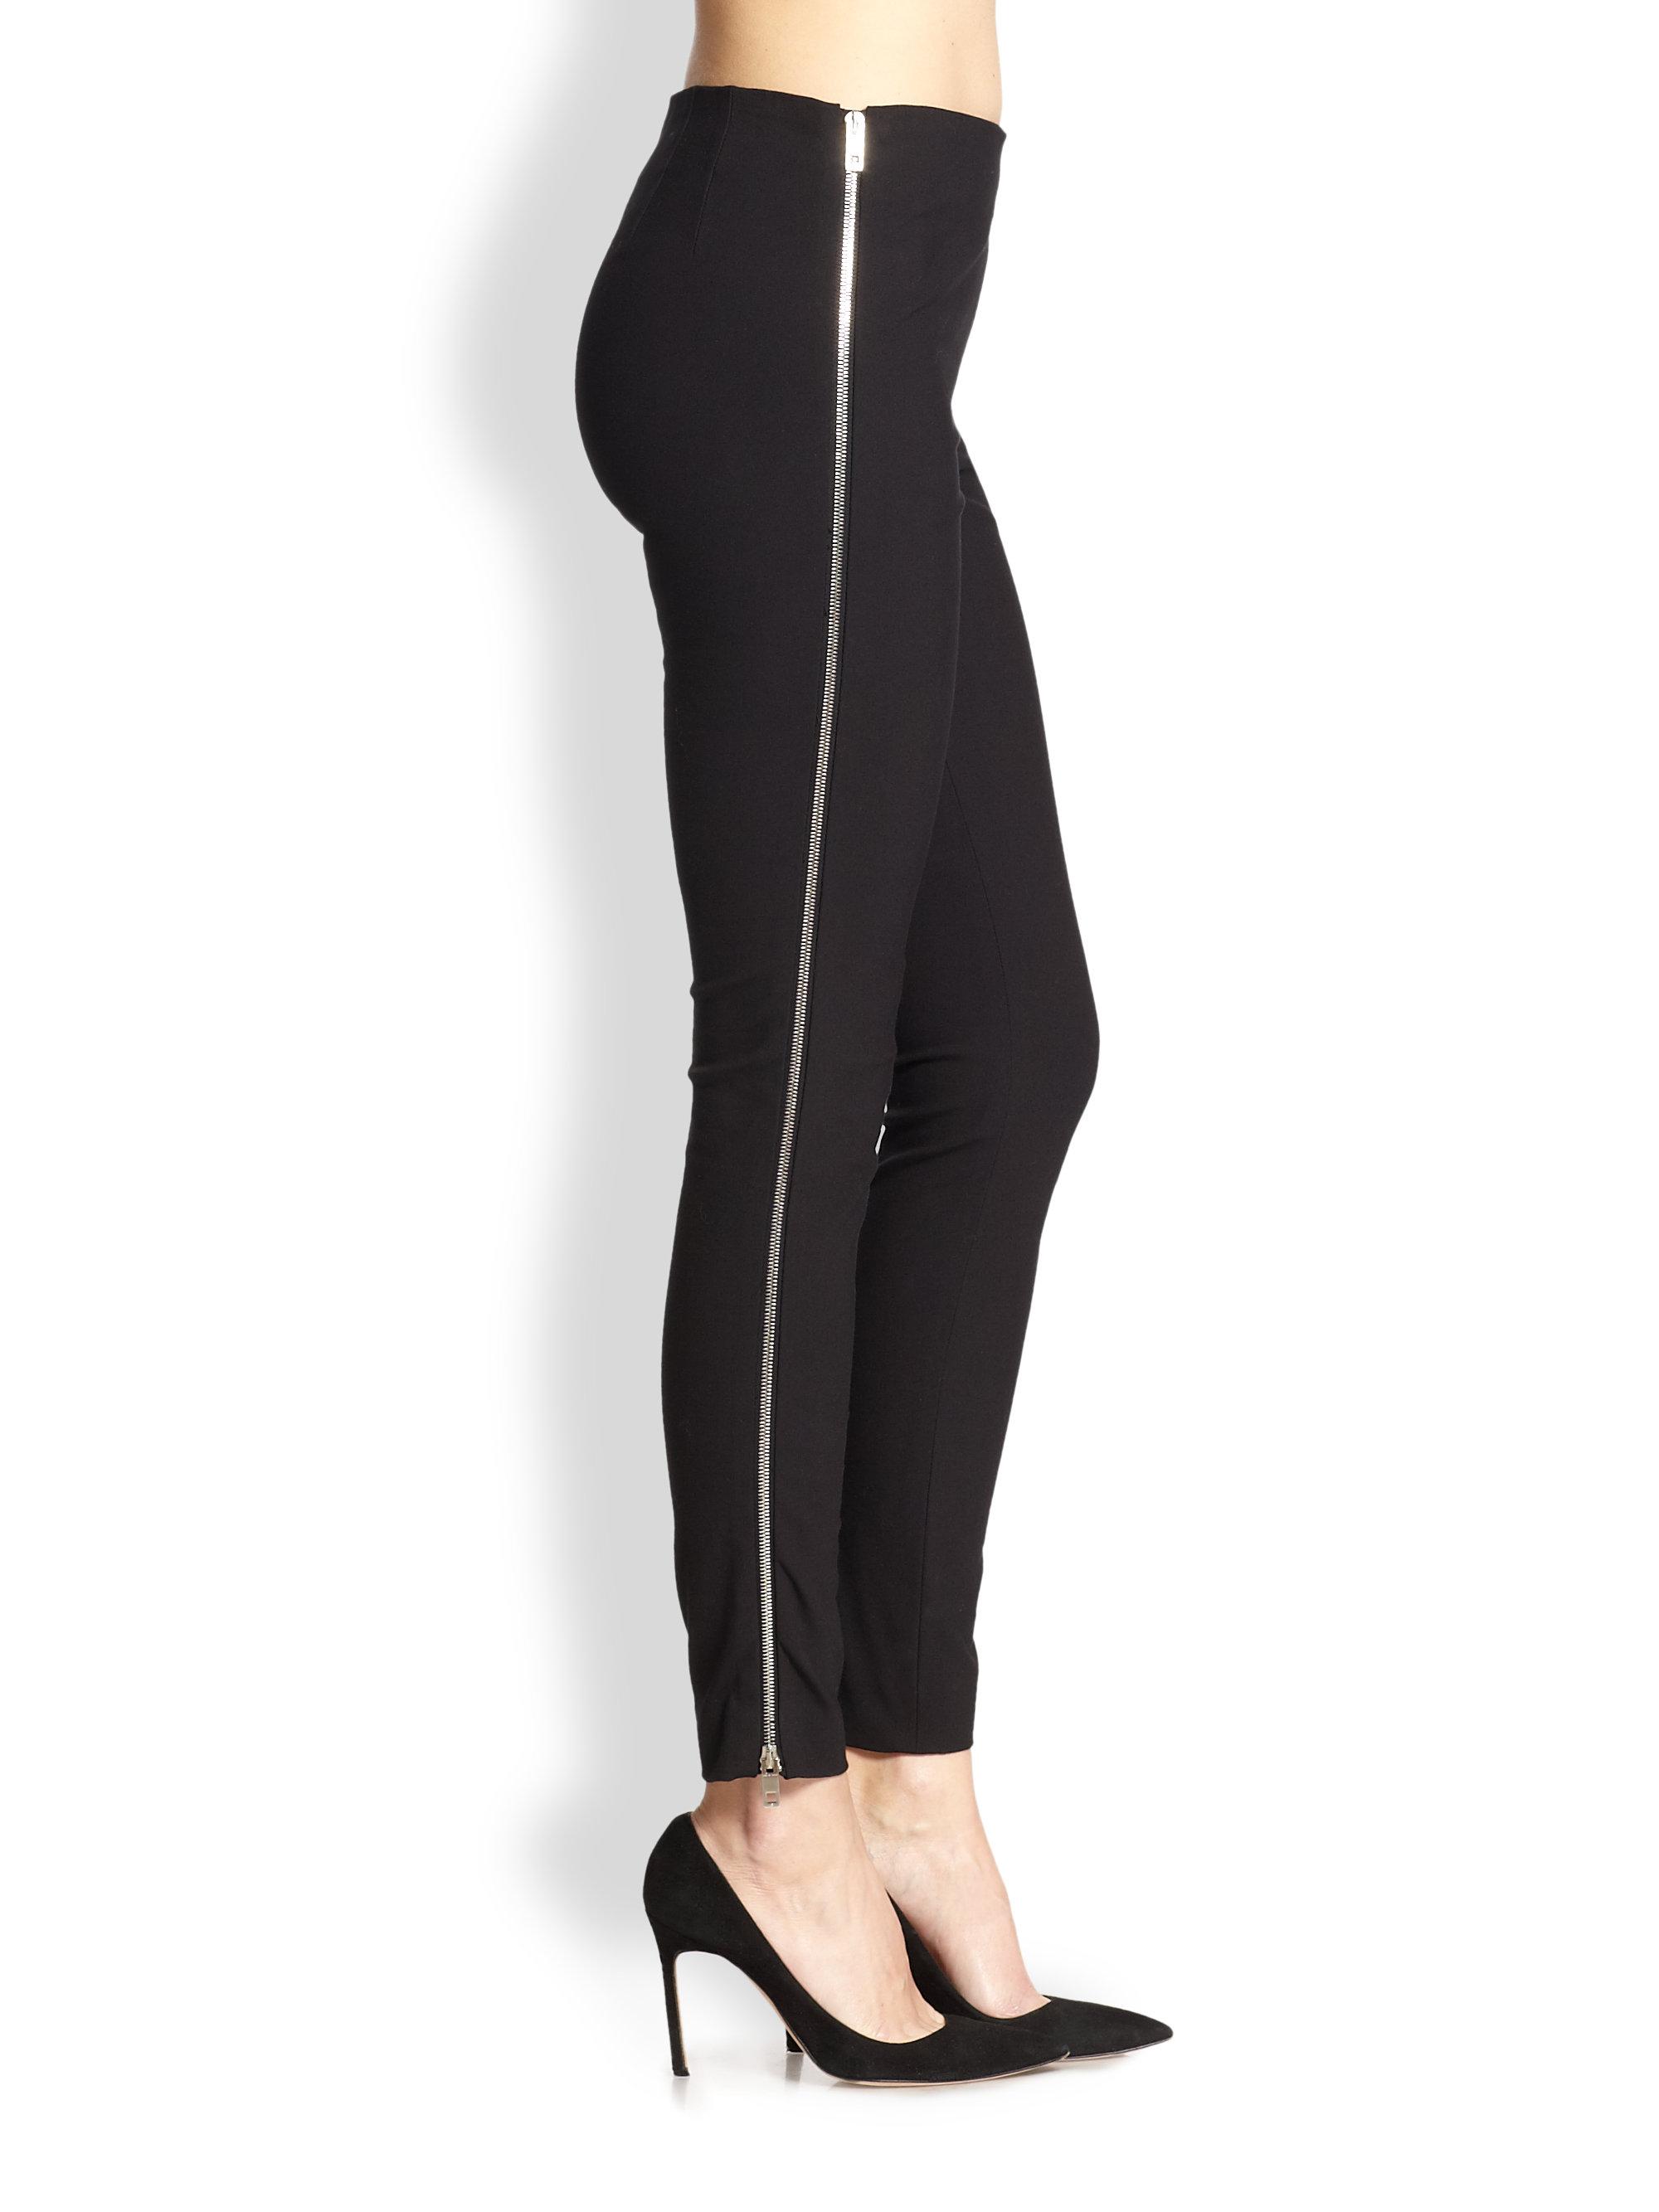 Anatomie Thea Straight-Leg Ankle-Length Pants w/ Side Zip Pockets Details Anatomie